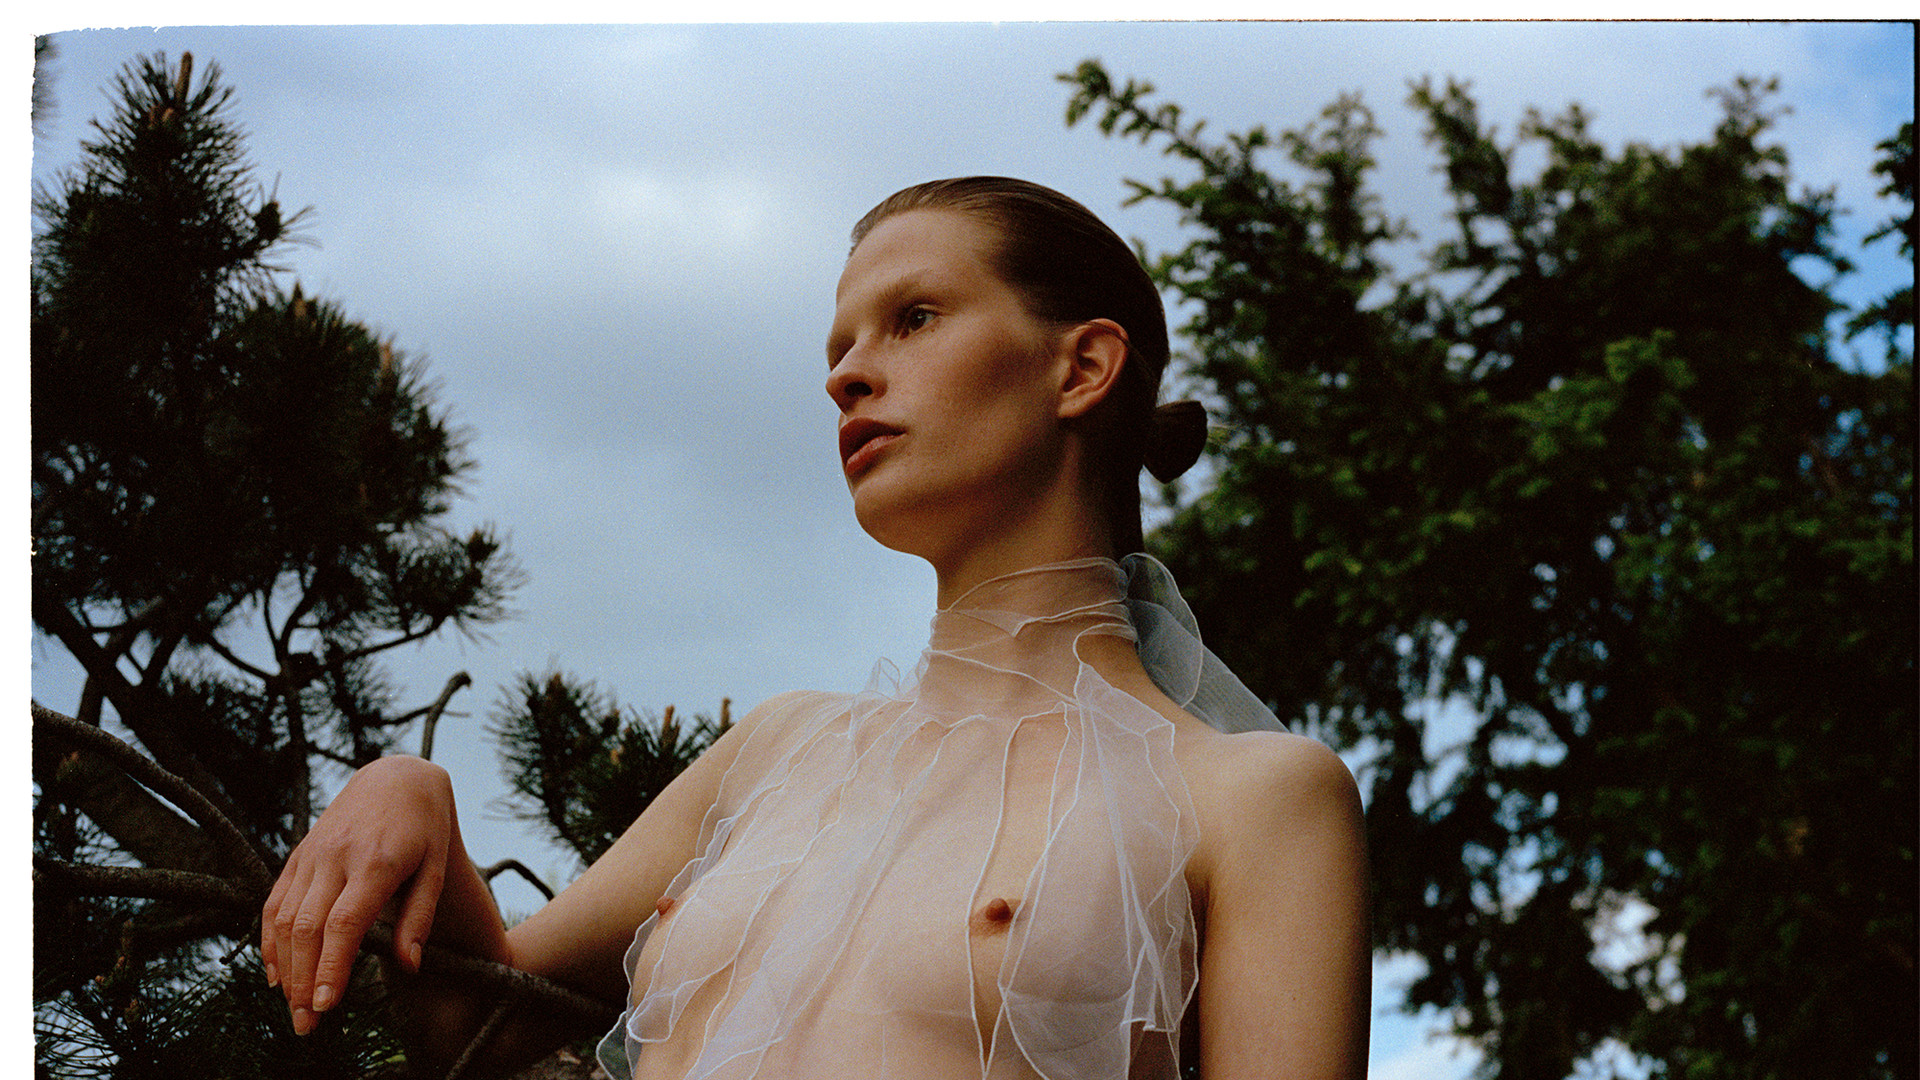 Hannah by Stephanie Pfaender, Achtung Mode